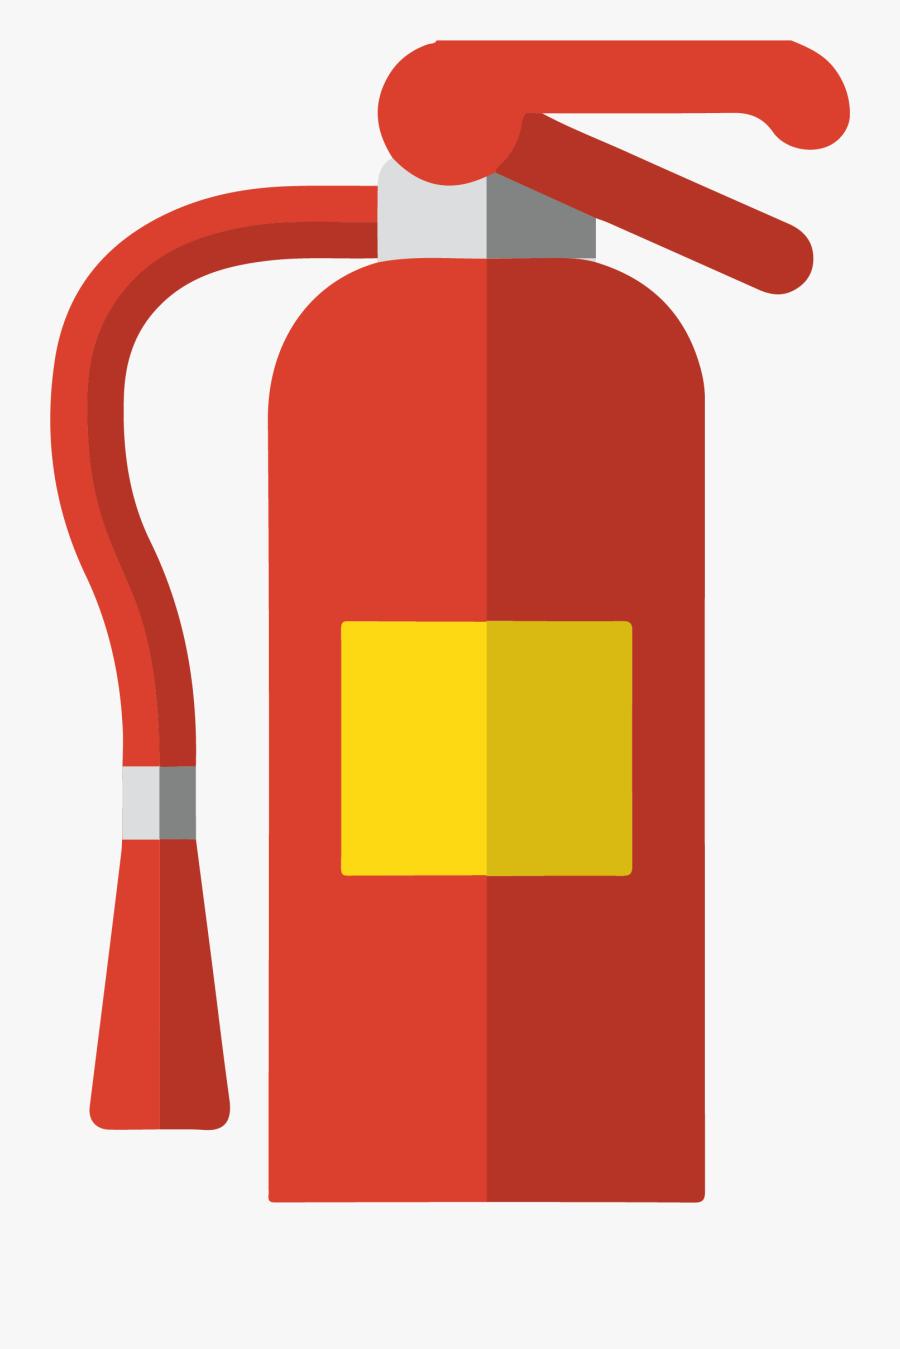 Extinguisher Png Image - Fire Extinguisher Clipart Png, Transparent Clipart